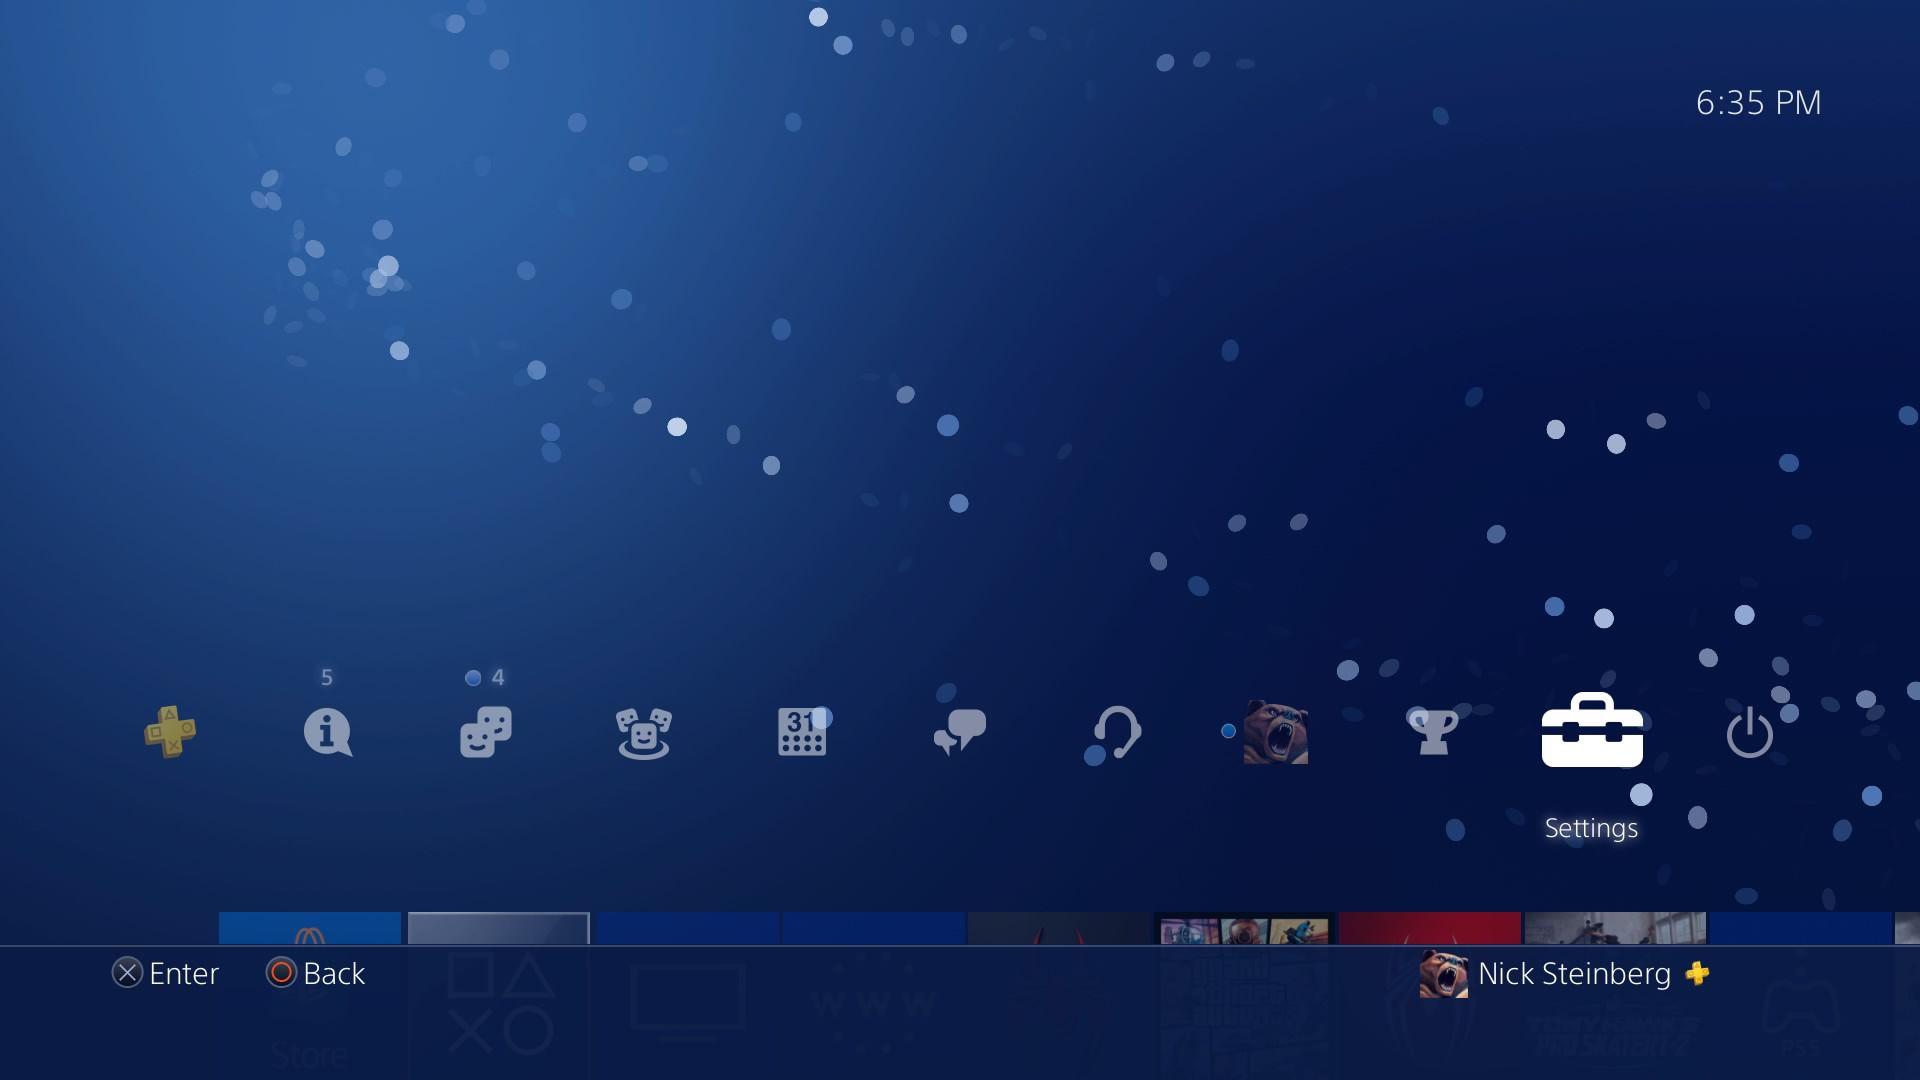 Highlighting Settings on PS4 dashboard.